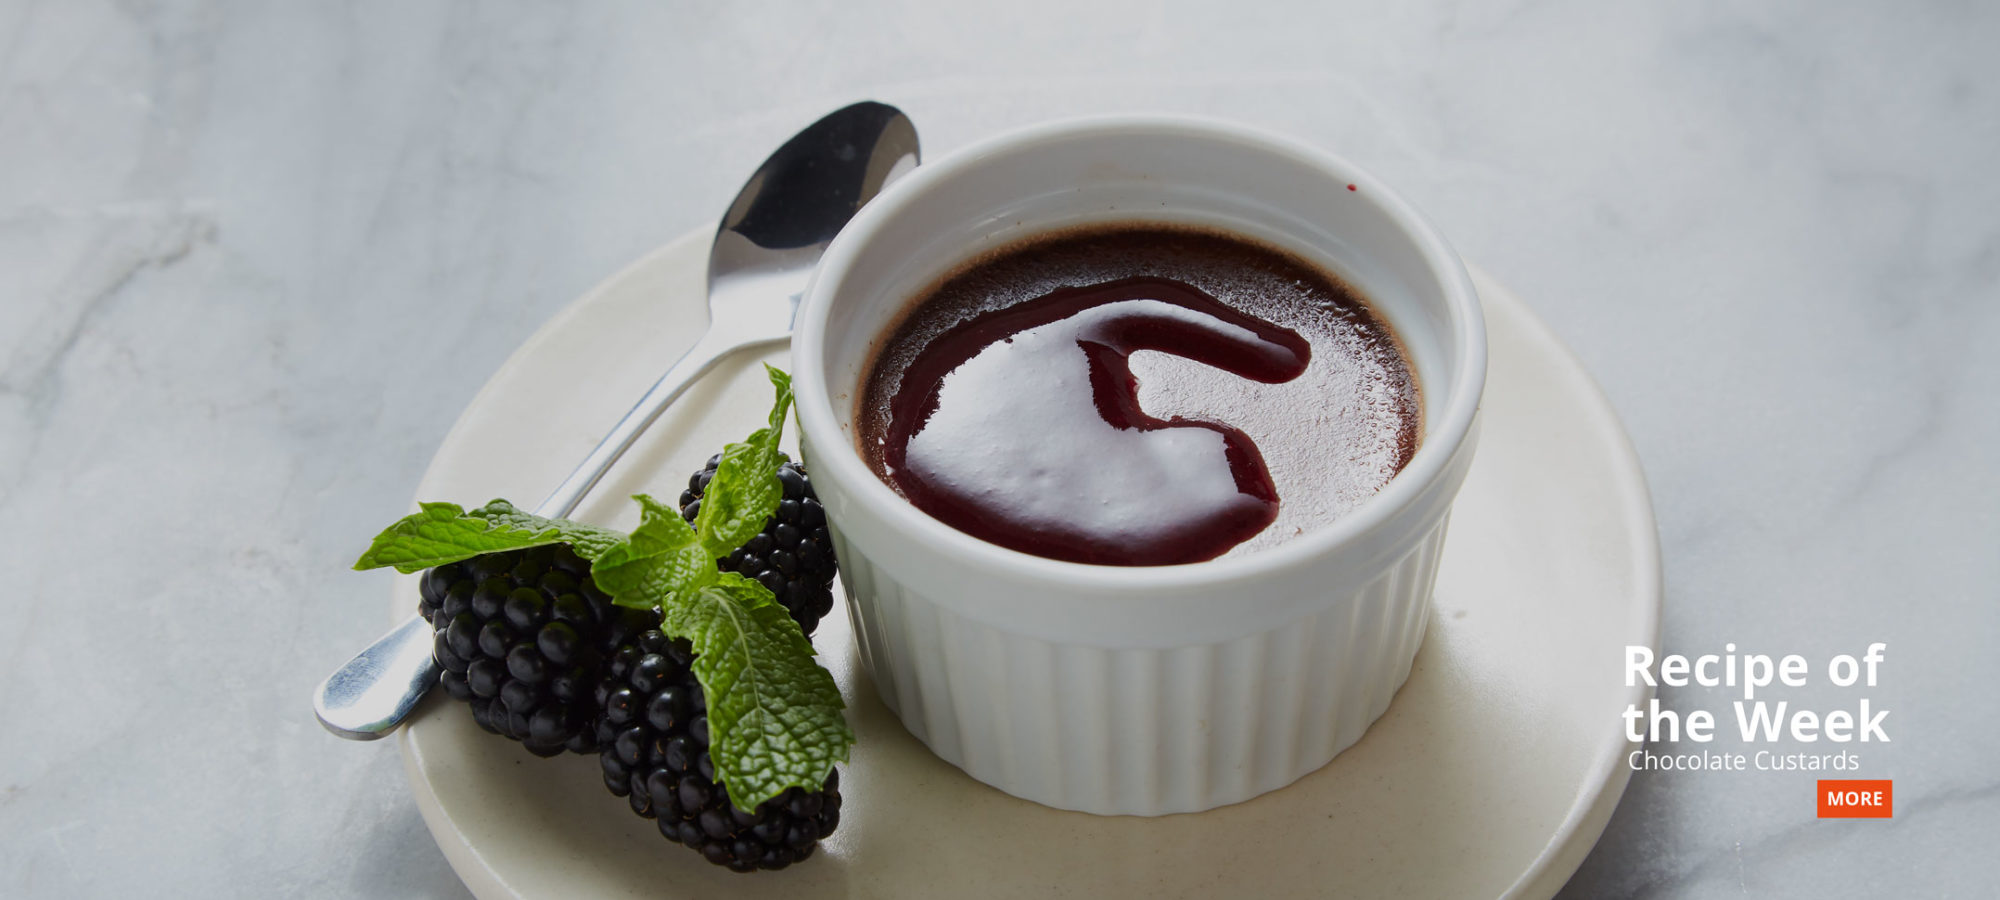 Jericalla Chocolate Custards